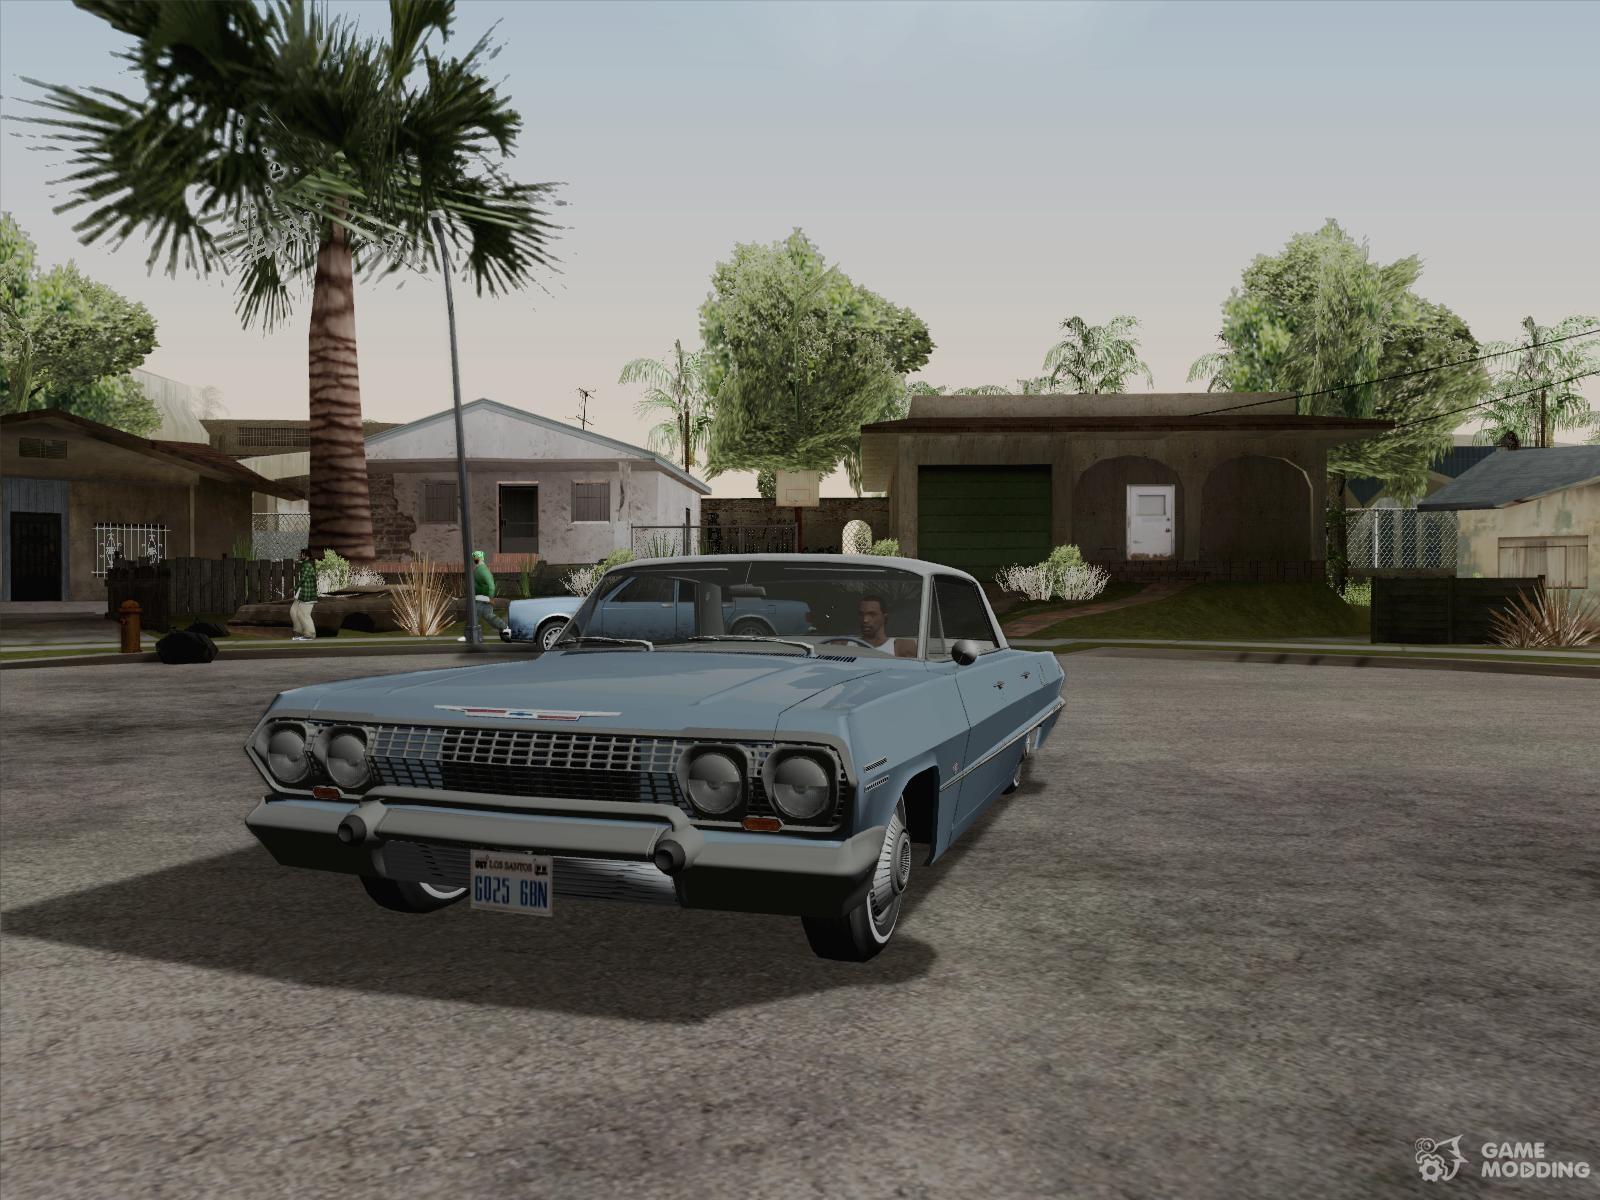 Chevrolet impala 4 door hardtop 1963 for gta san andreas - Chevrolet Impala 4 Door Hardtop 039 63 For Gta San Andreas